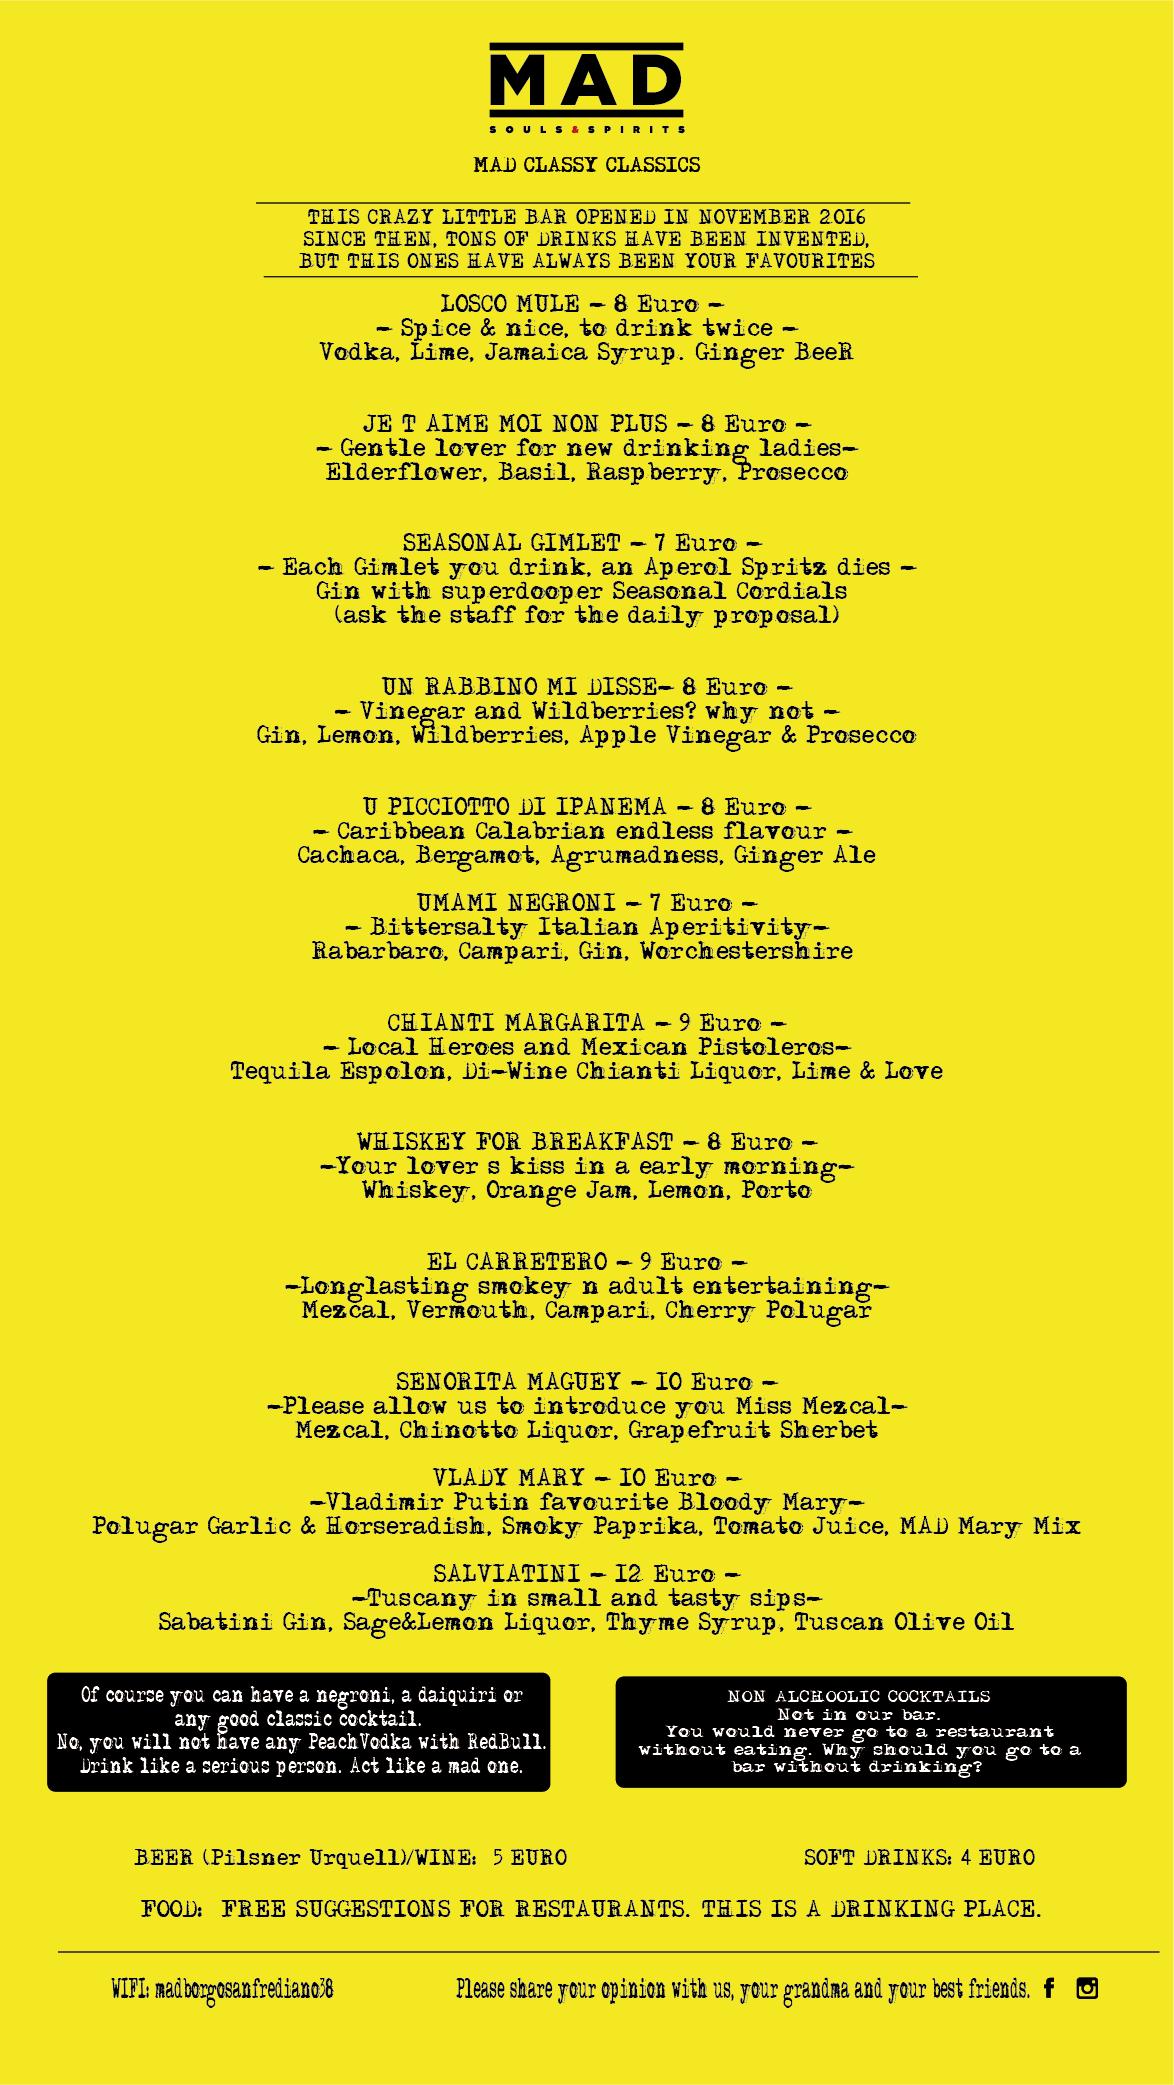 MAD SOULS & SPIRITS FIRENZEErgonauth Agenzia di Comunicazione e Type a Firenze Giulia Ursenna Dorati, Typography, Calligraphy, Font Design, Type Design, Calligrafia, Lettering, Social media management, Social Media Marketing, Music Label, Etichetta discografica, IED Firenze, ISIA Firenze, The Sign Firenze, GUD, Typography Firenze, Calligraphy Firenze, Font Design Firenze, Type Design Firenze, Calligrafia Firenze, Lettering Firenze, Social media management Firenze, Social Media Marketing Firenze, Music Label Firenze, Etichetta discografica Firenze